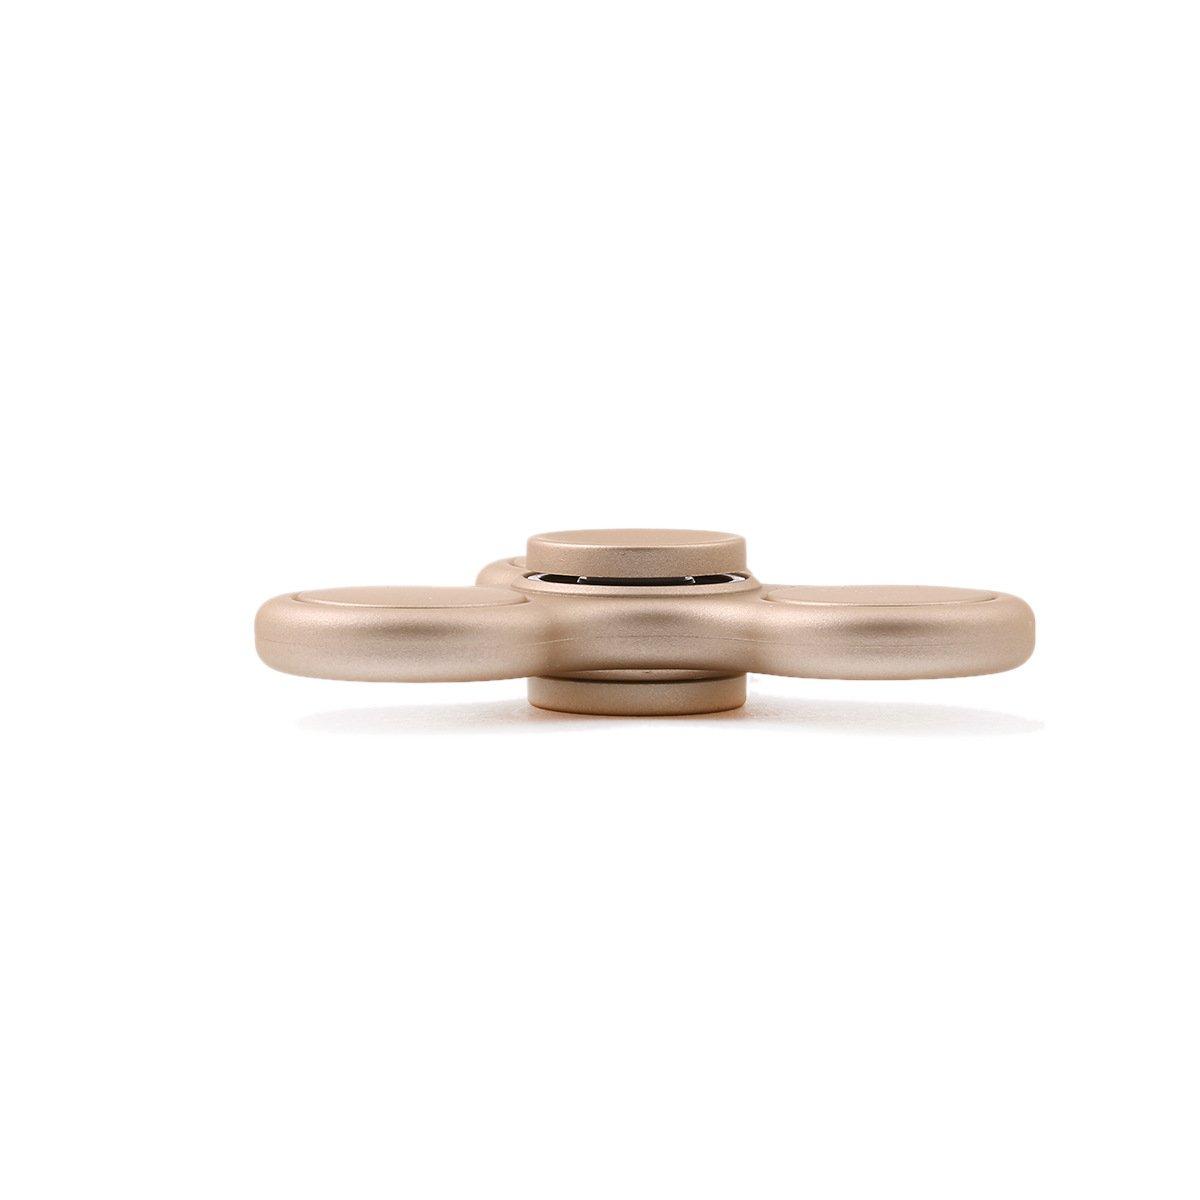 Mute Bearing Uharbour ElitePro Prime Anti Stress Hand Toy Fidget Tri-Spinner Luxury Gold for Kids